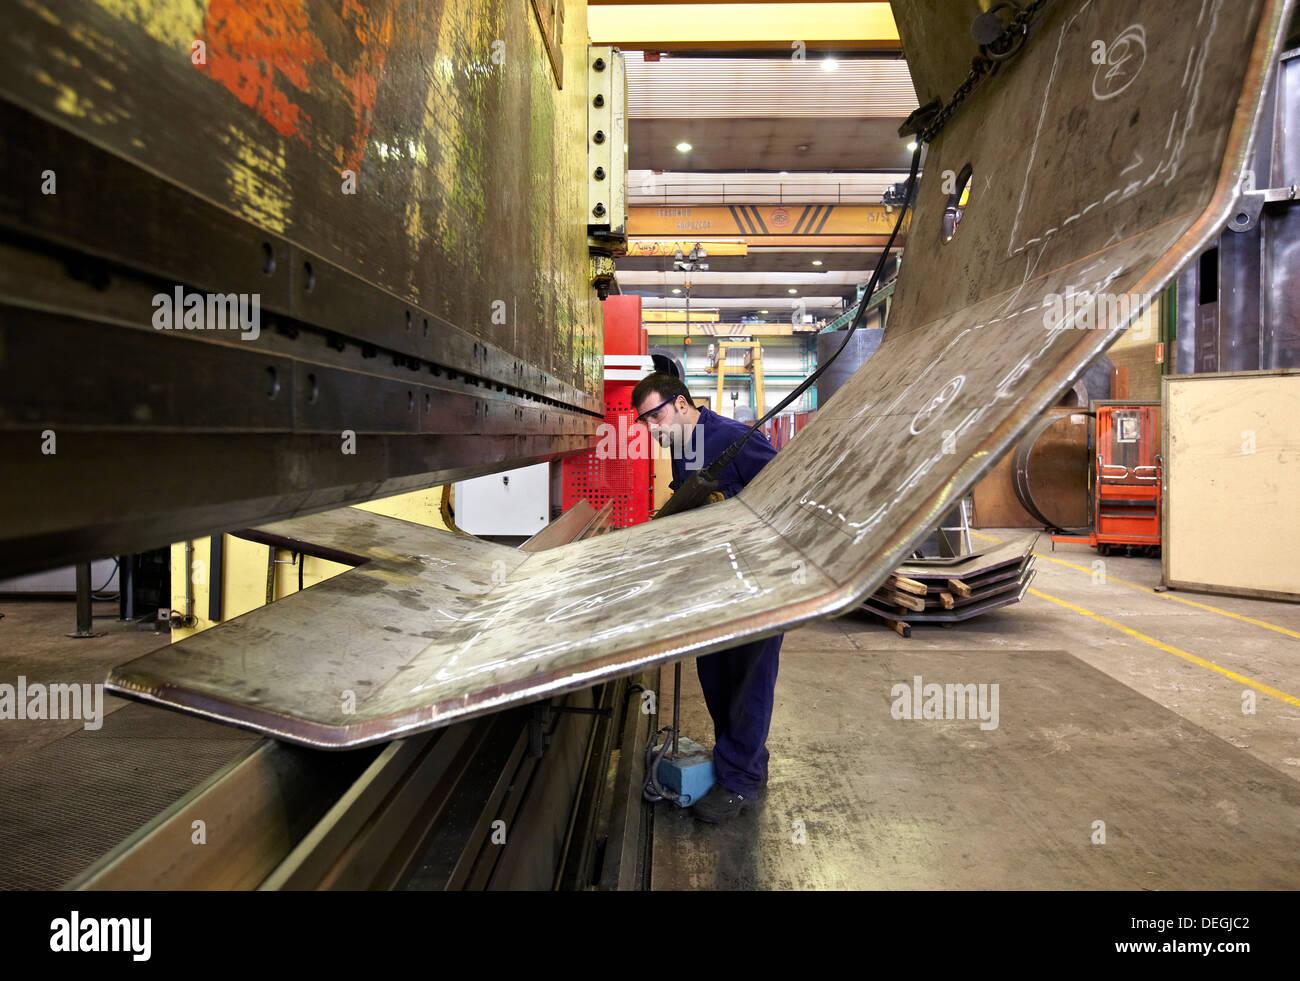 Sheet metal folder, boilermaking, Guipuzcoa, Basque Country, Spain - Stock Image